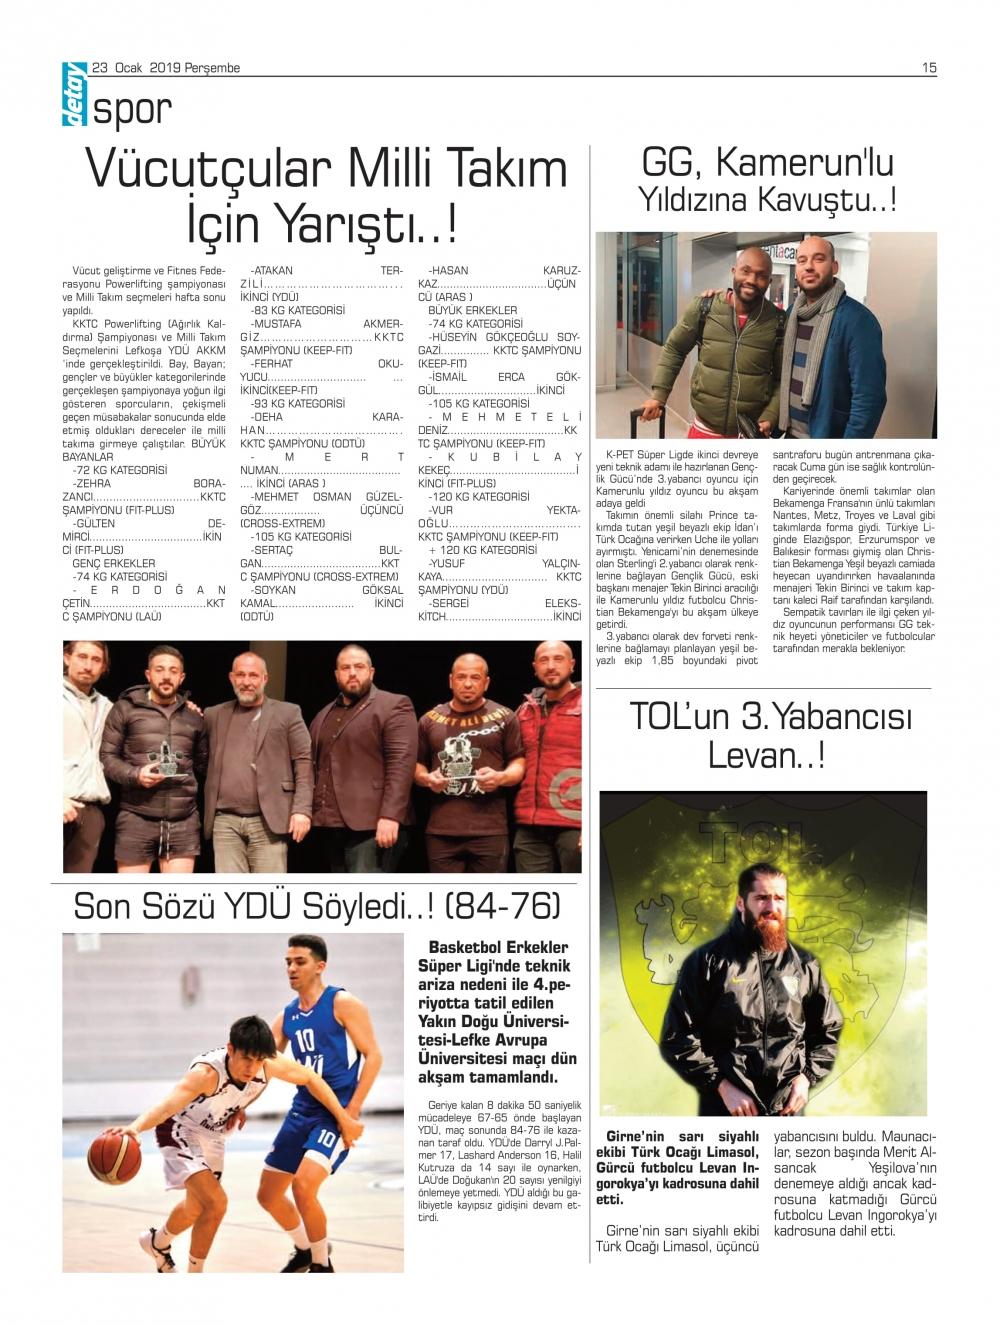 Detay Gazetes 23 Ocak 2020 galerisi resim 10